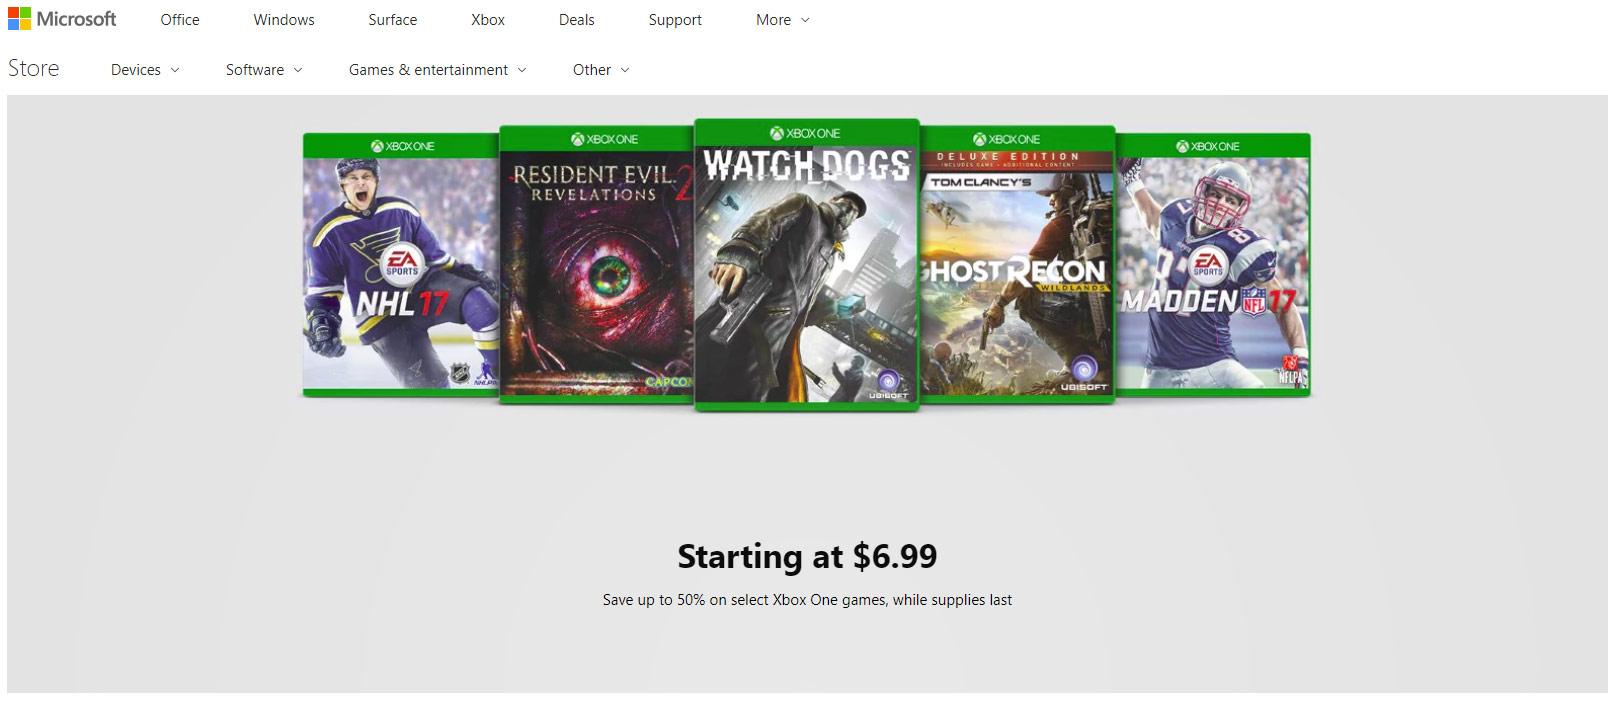 Microsoft Store's Xbox One game clearance sale starts at $4.99 screenshot